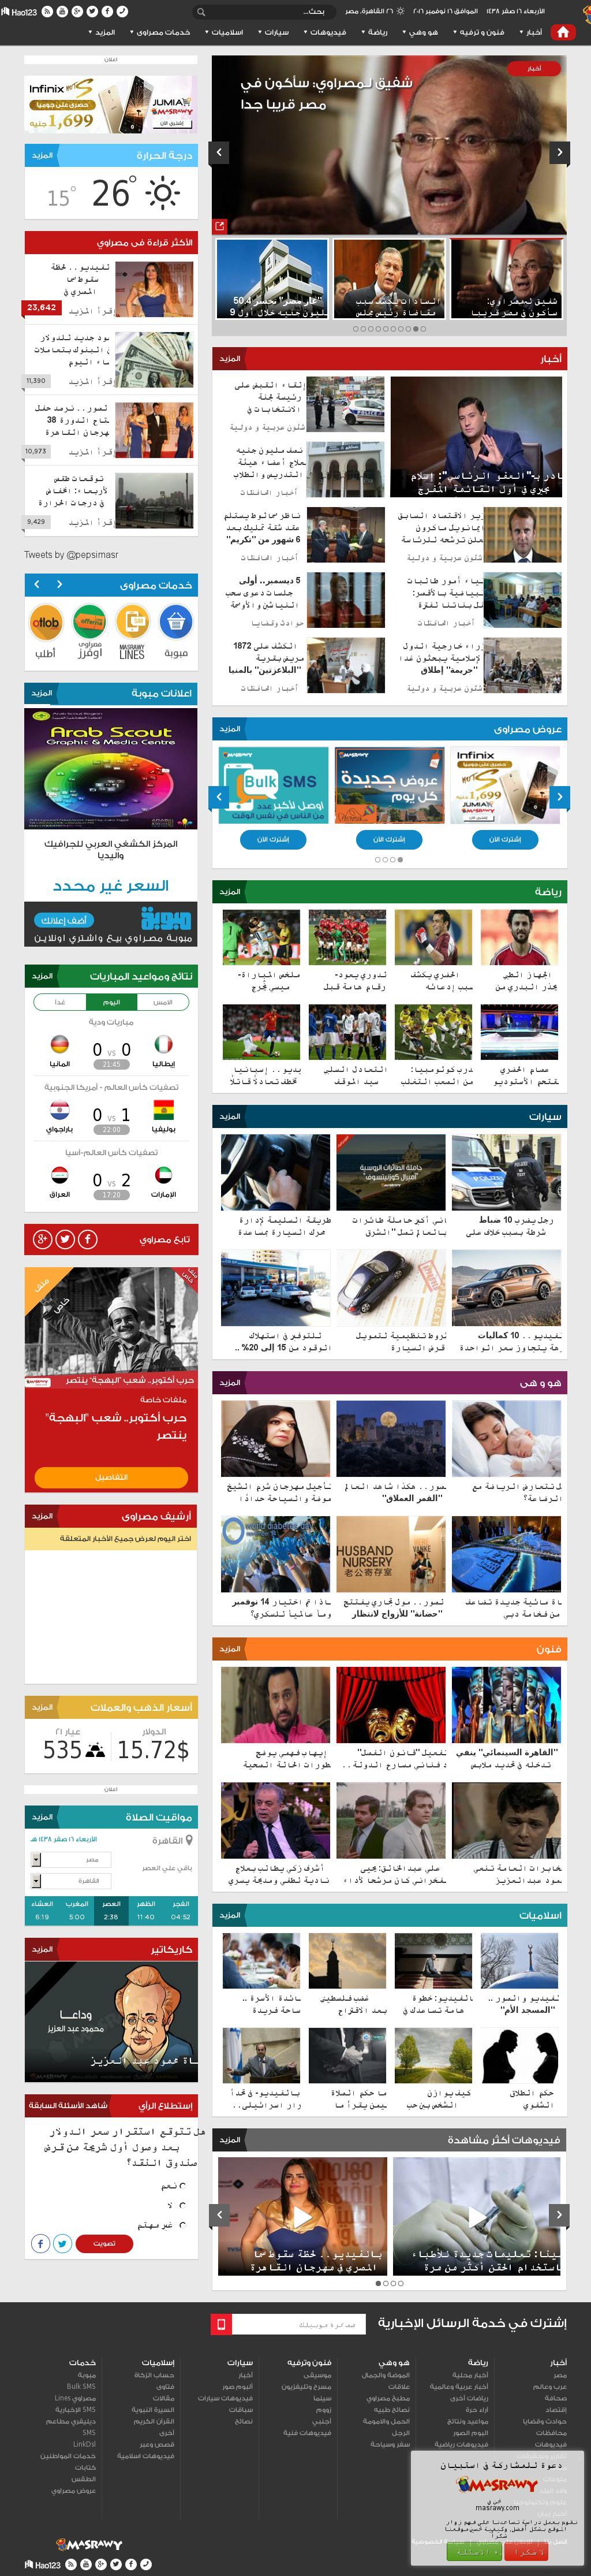 Masrawy at Wednesday Nov. 16, 2016, 11:09 a.m. UTC